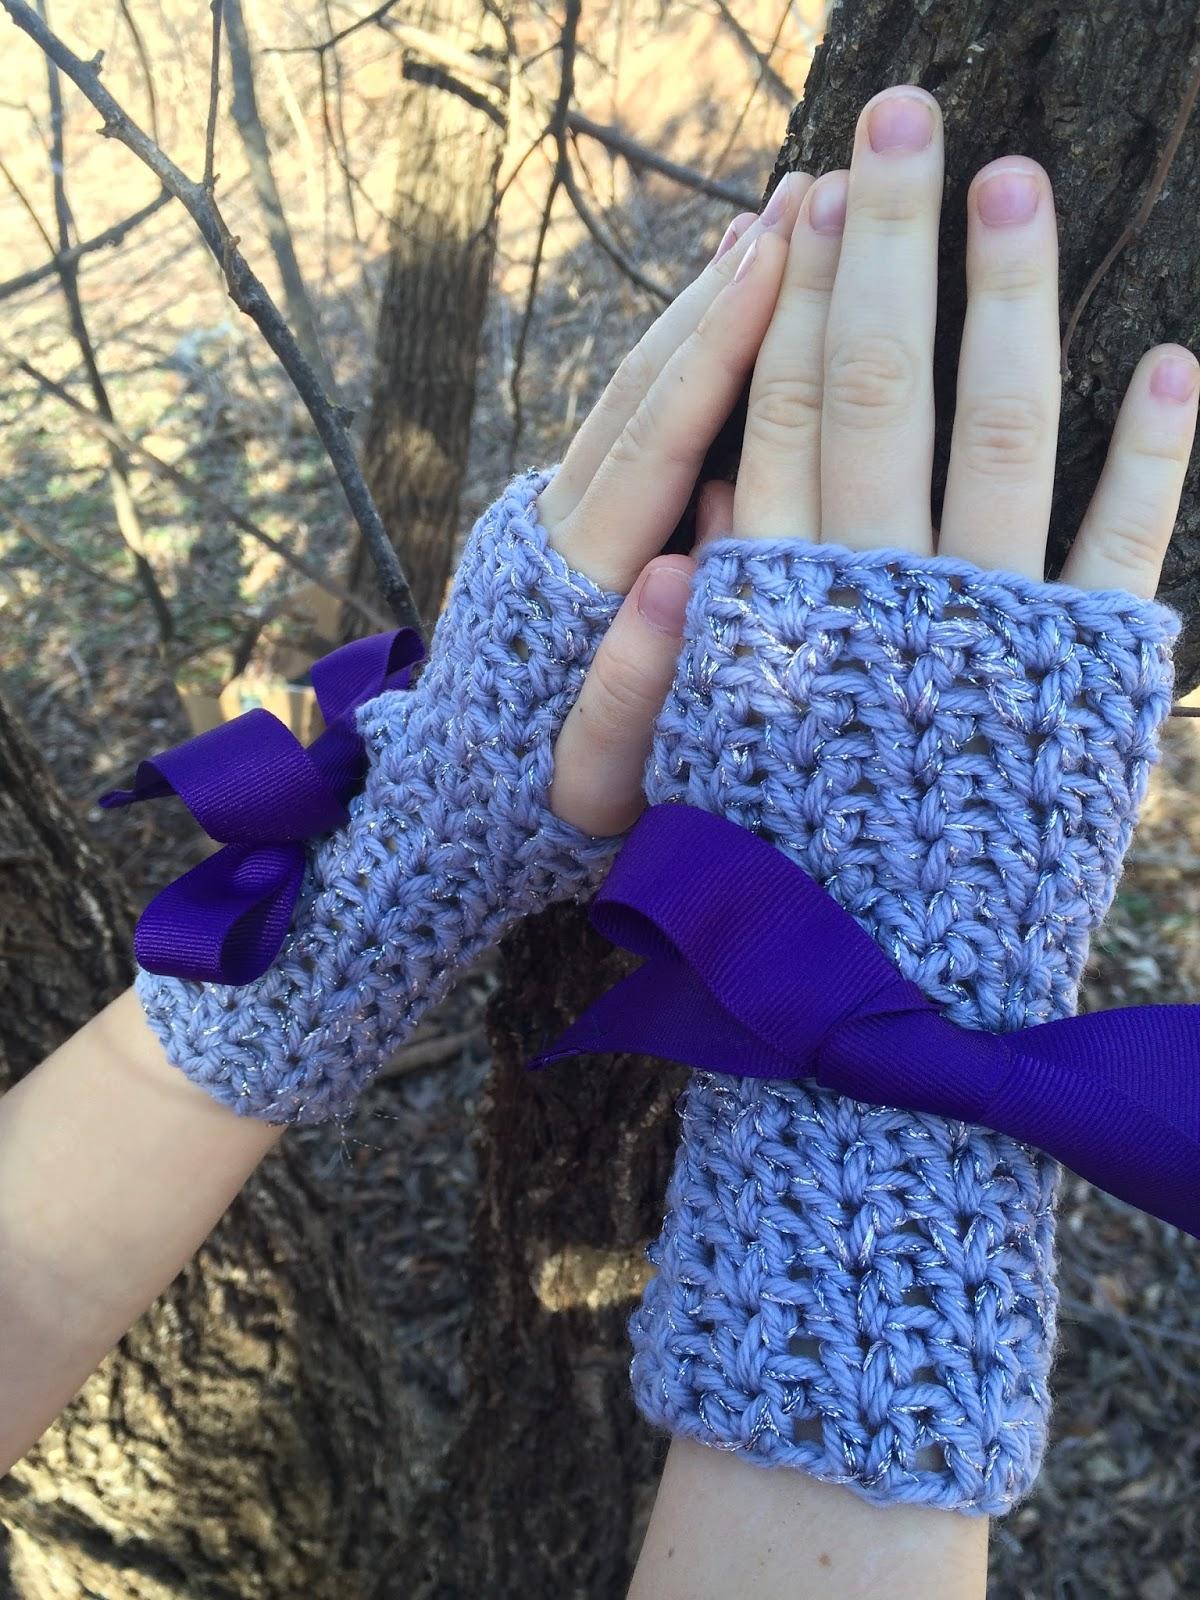 Crochet wrist warmers for girls, a FREE crochet pattern by April Garwood of Banana Moon Studio